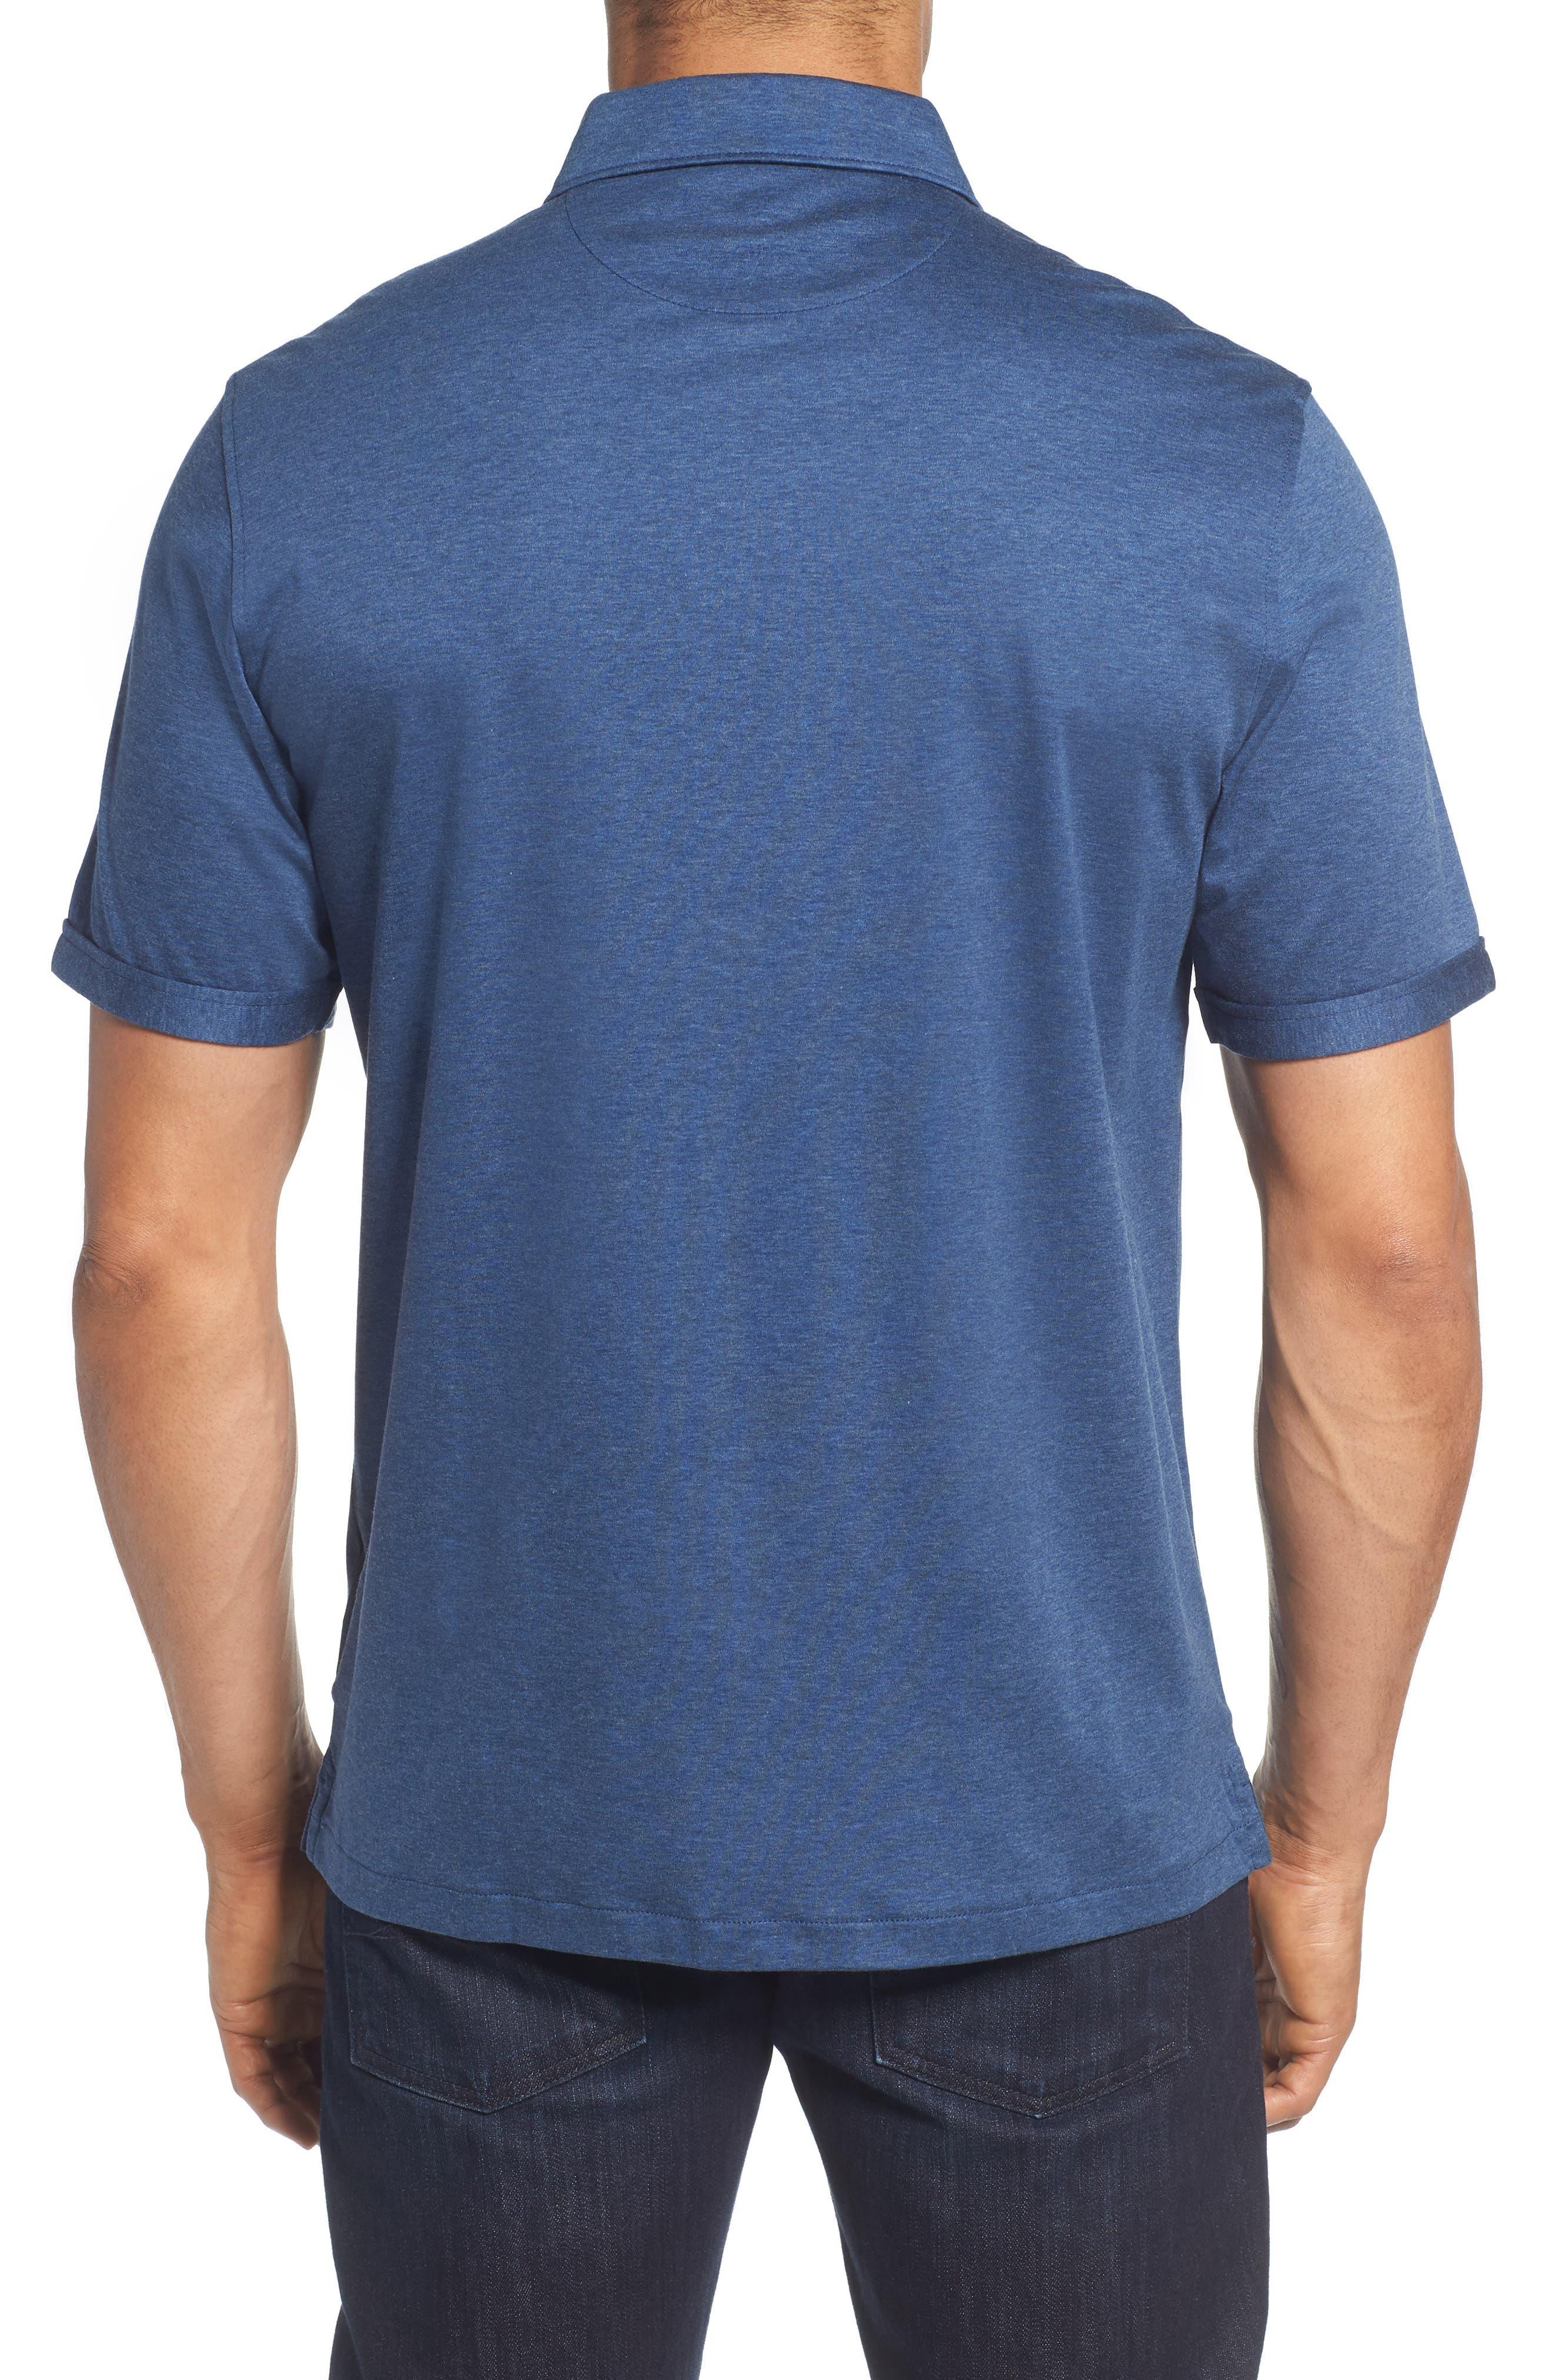 Regular Fit Heather Knit Sport Shirt,                             Alternate thumbnail 2, color,                             NAVY